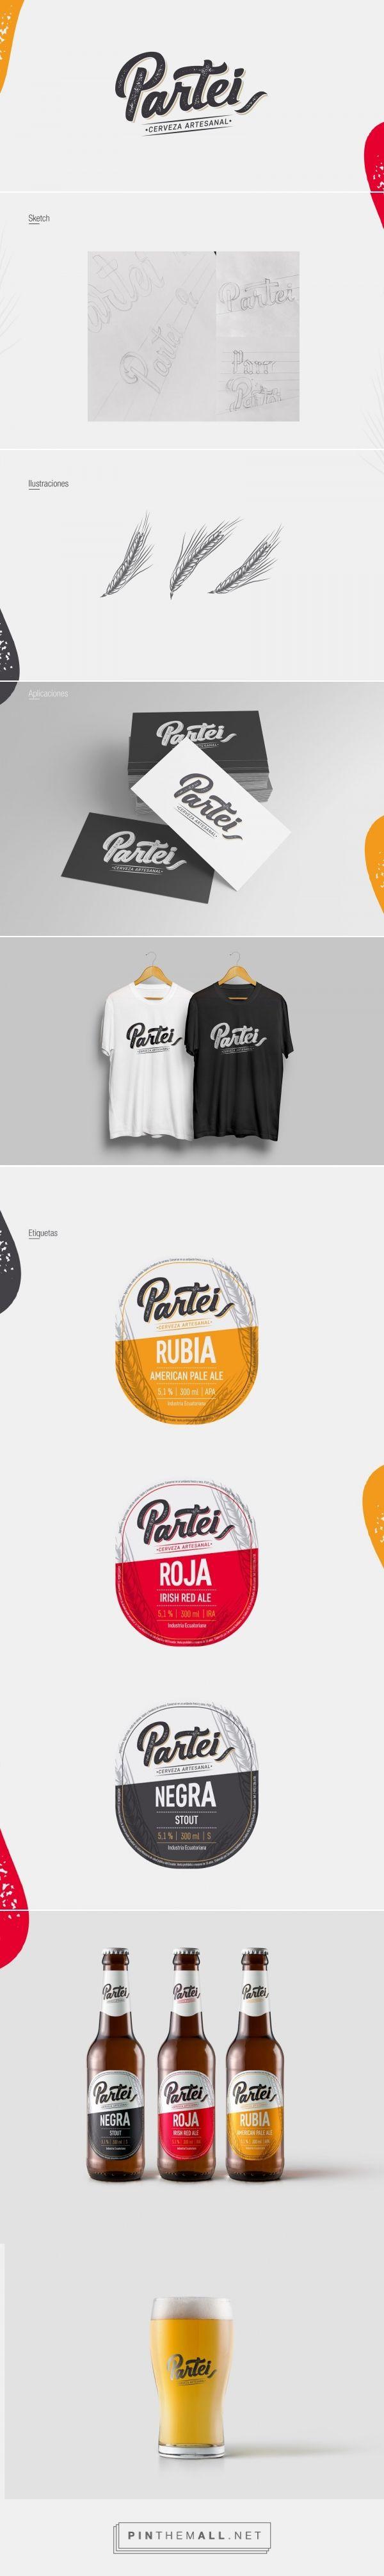 Partei Craft Beer - Packaging of the World - Creative Package Design Gallery - http://www.packagingoftheworld.com/2018/01/partei-craft-beer.html